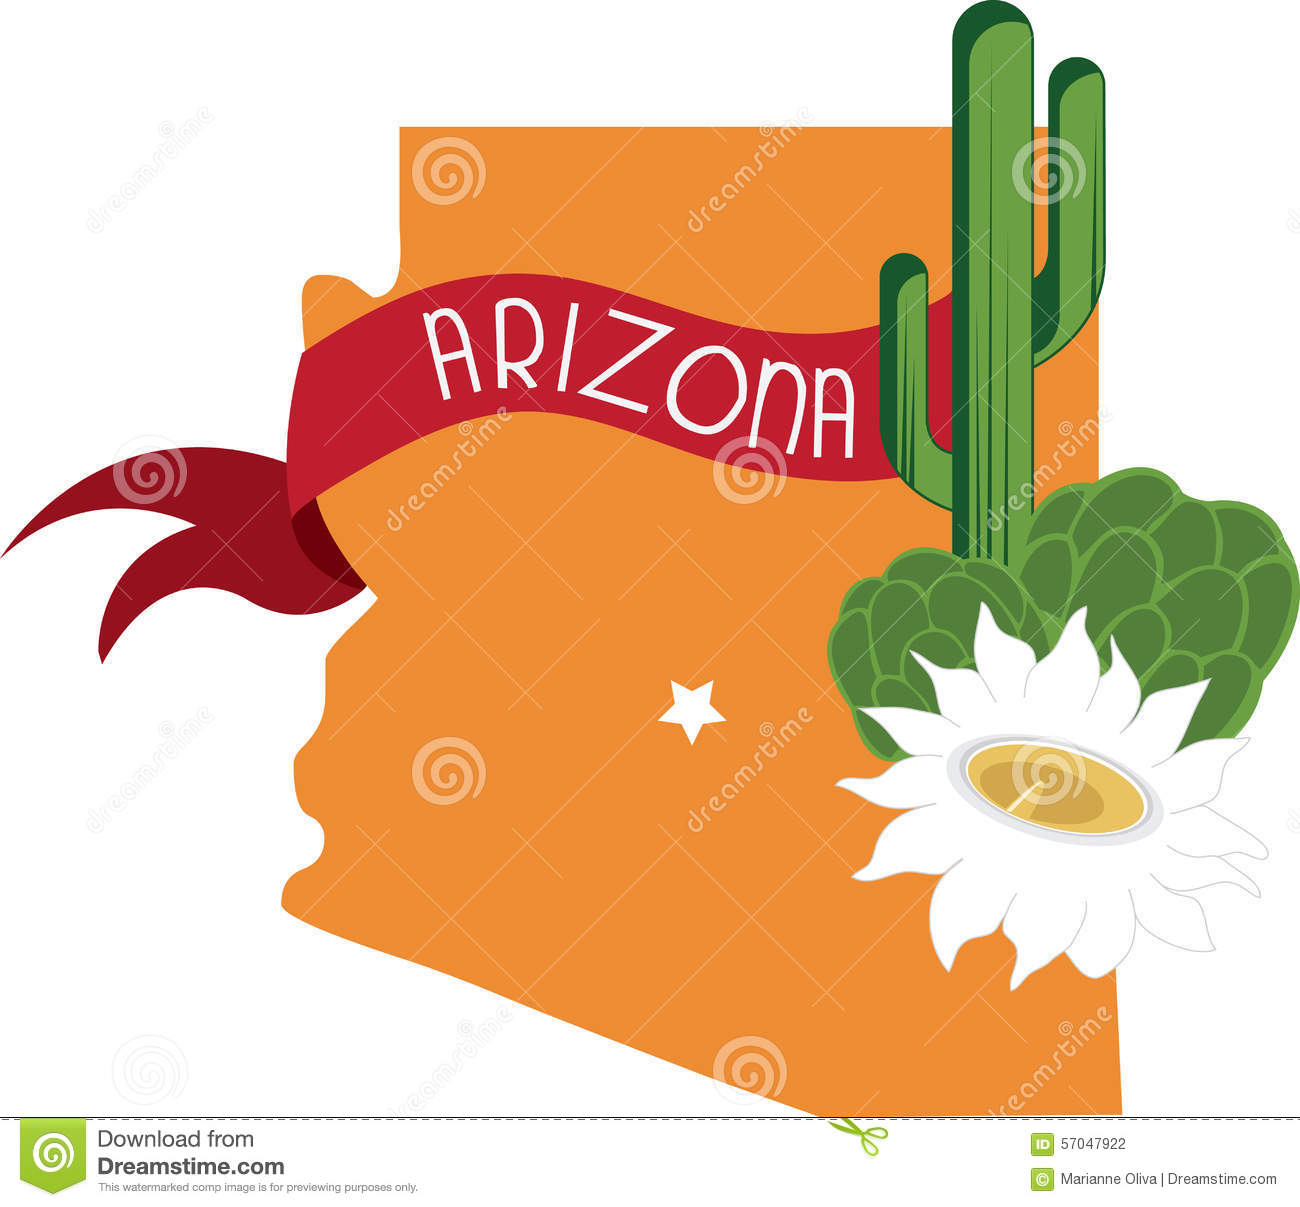 Arizona historical map clipart.